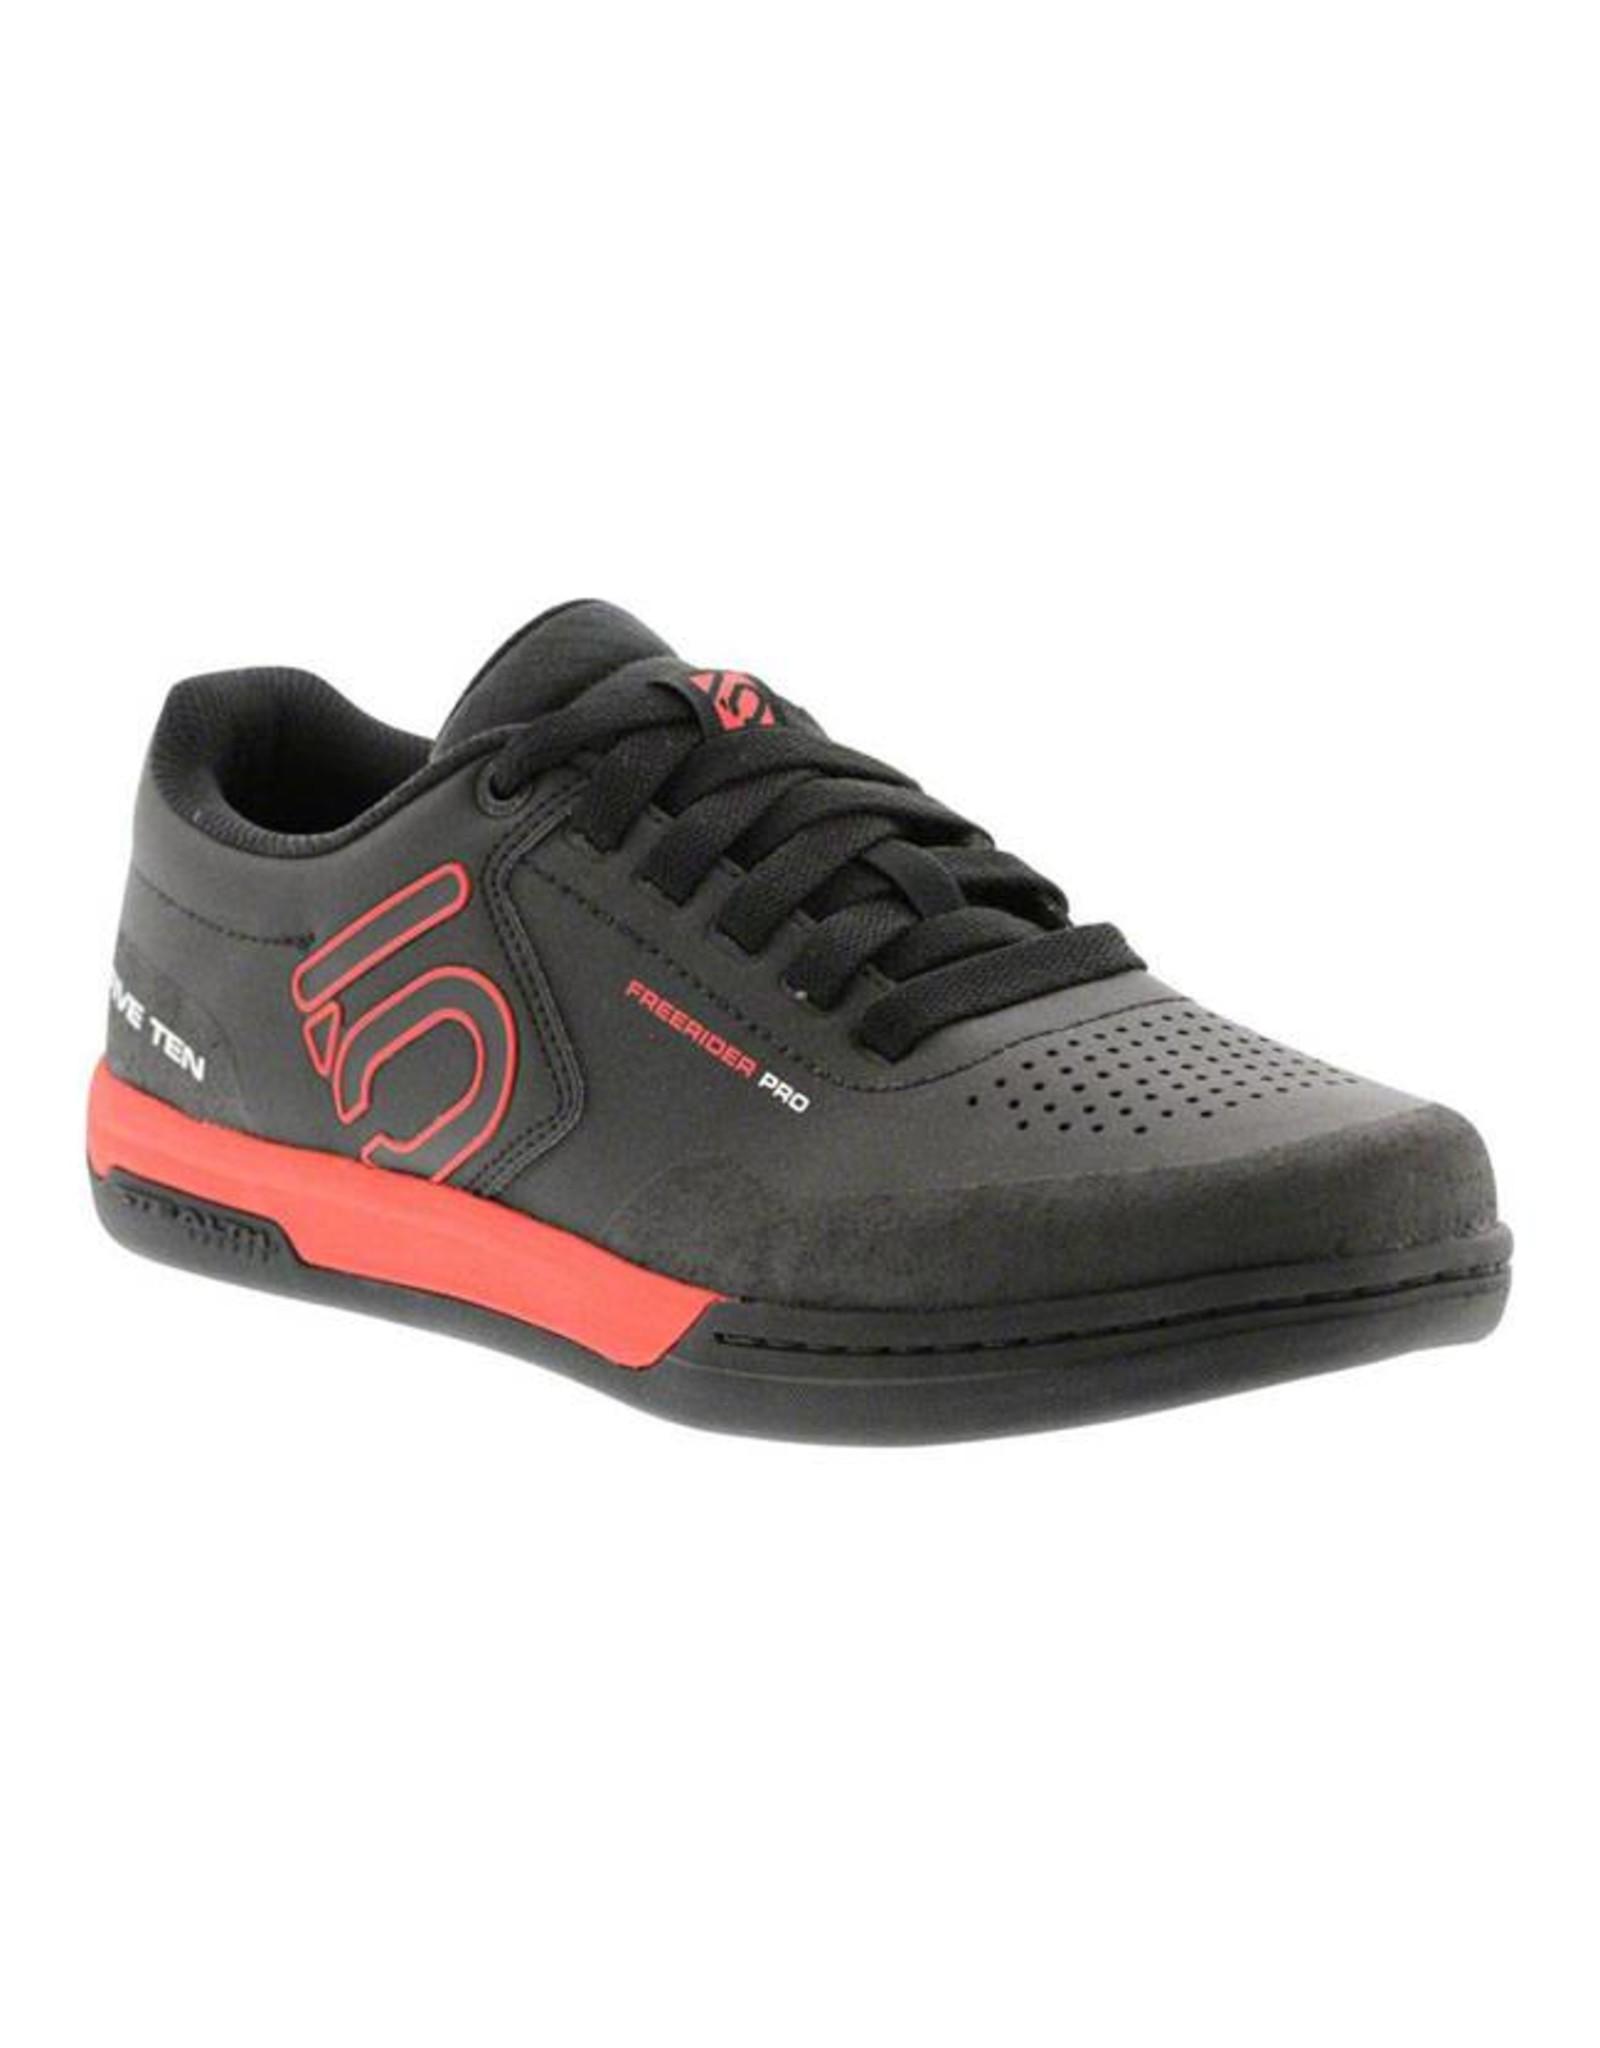 Five Ten Five Ten Freerider Pro Men's Flat Pedal Shoe: Black 7.5